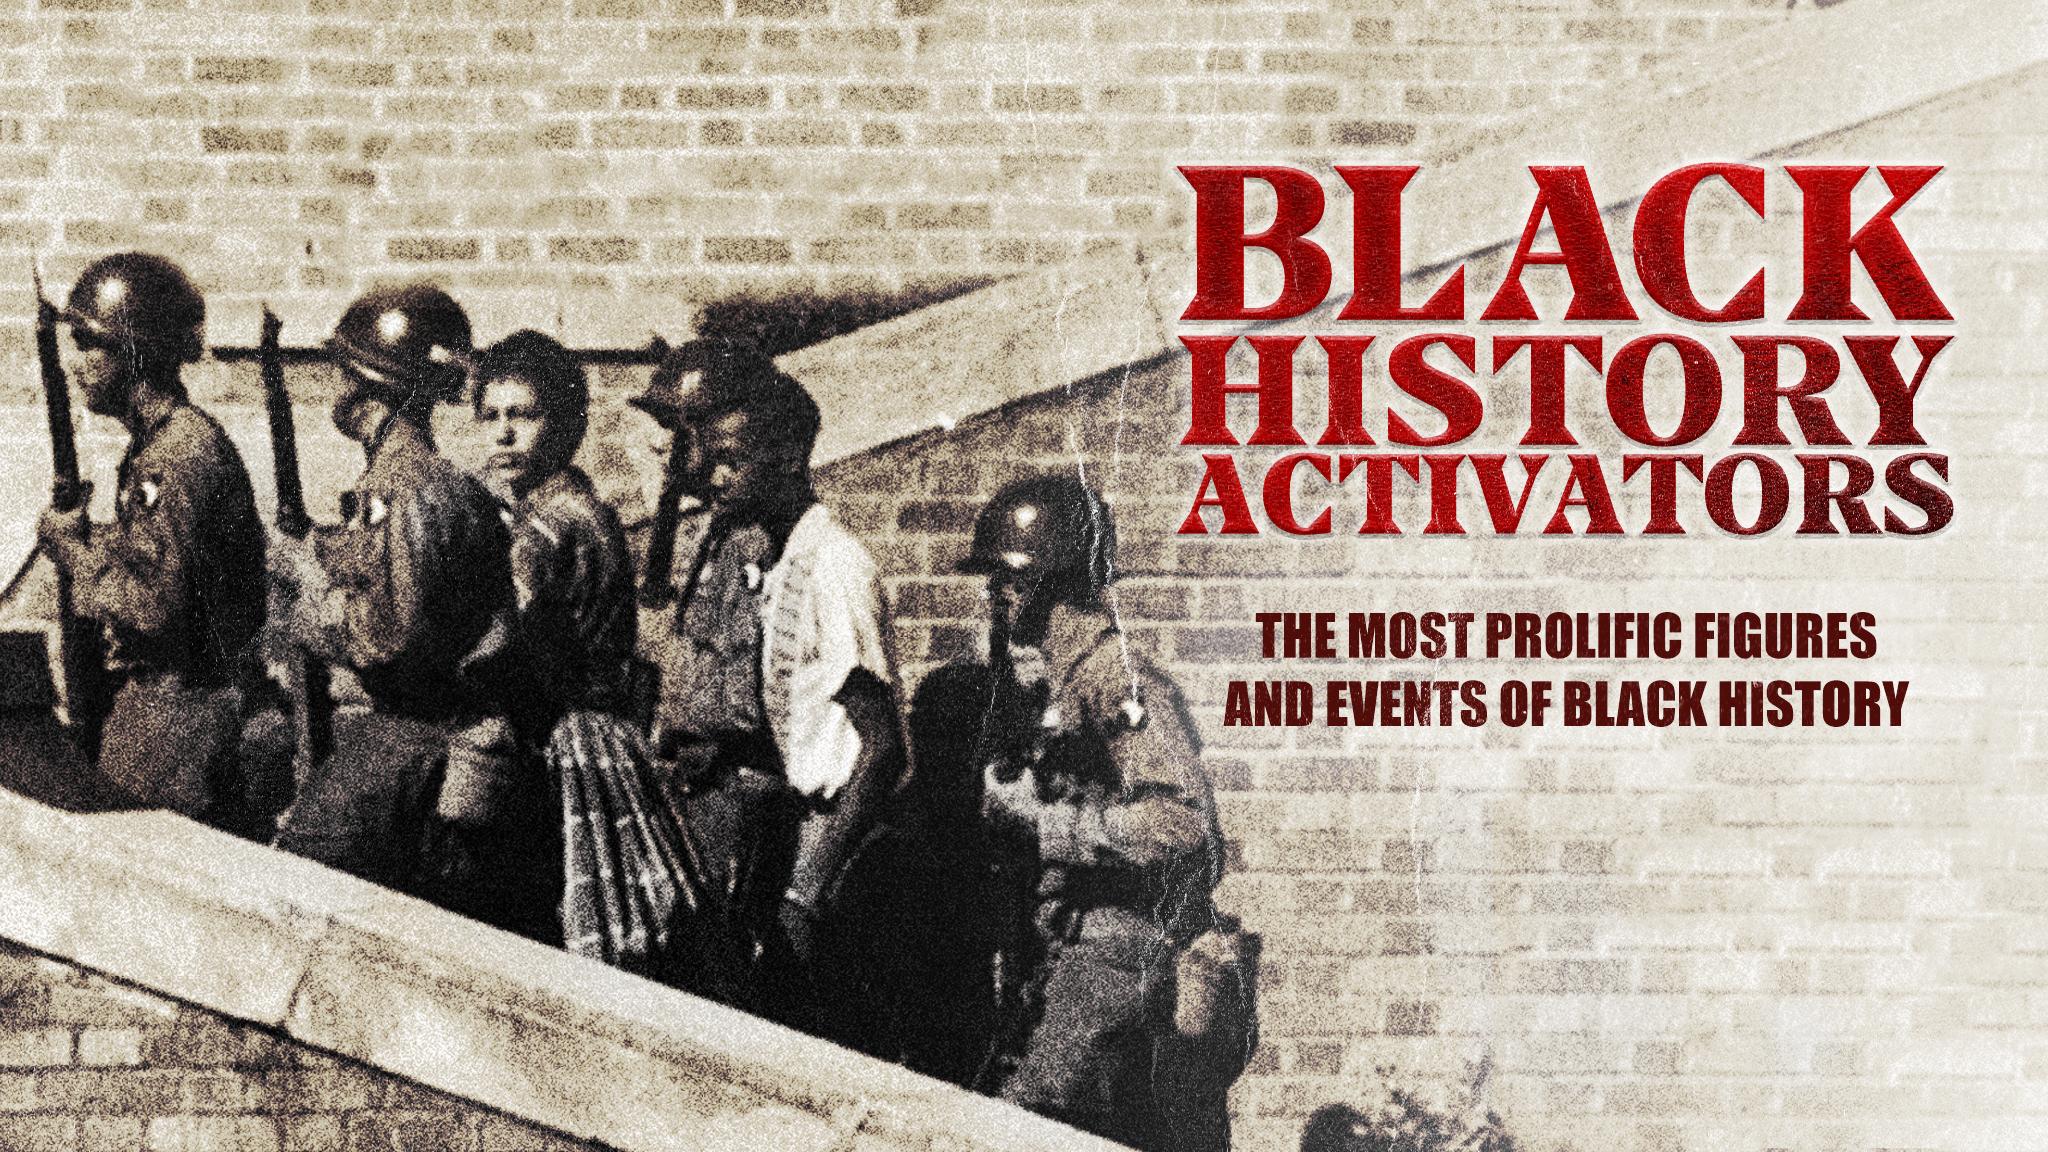 Watch Black History Activators Prime Video